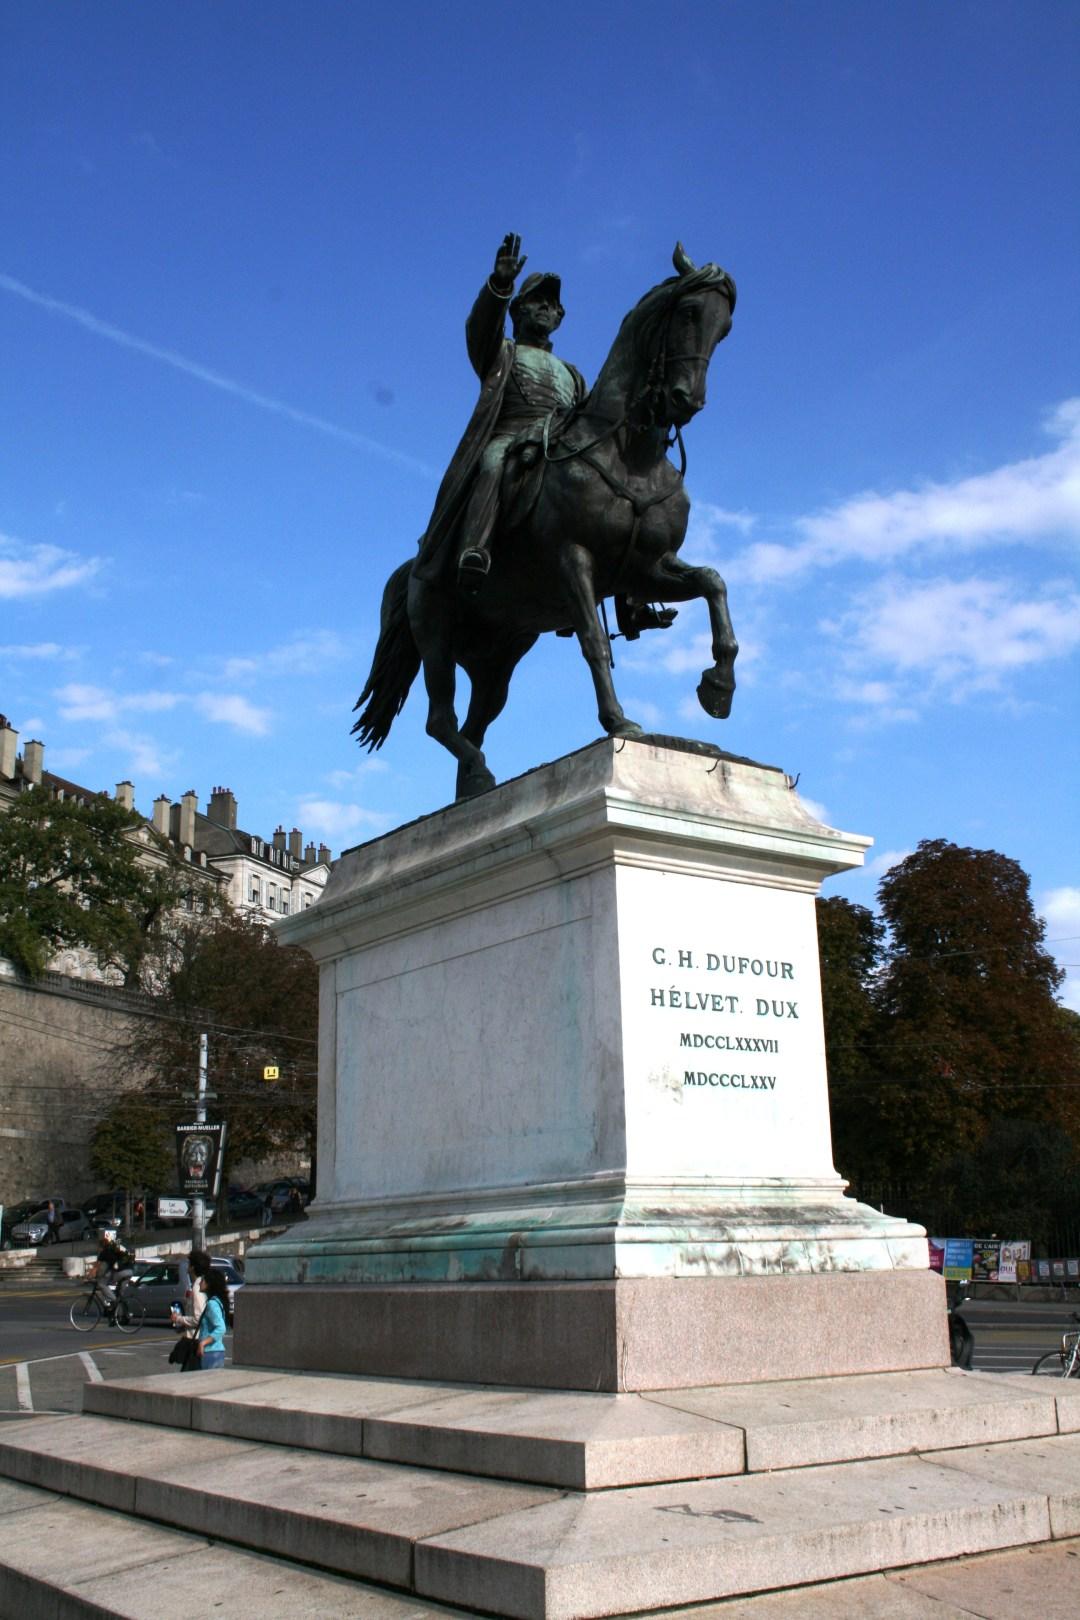 Geneva's expansion under Guillaume-Henri Dufour